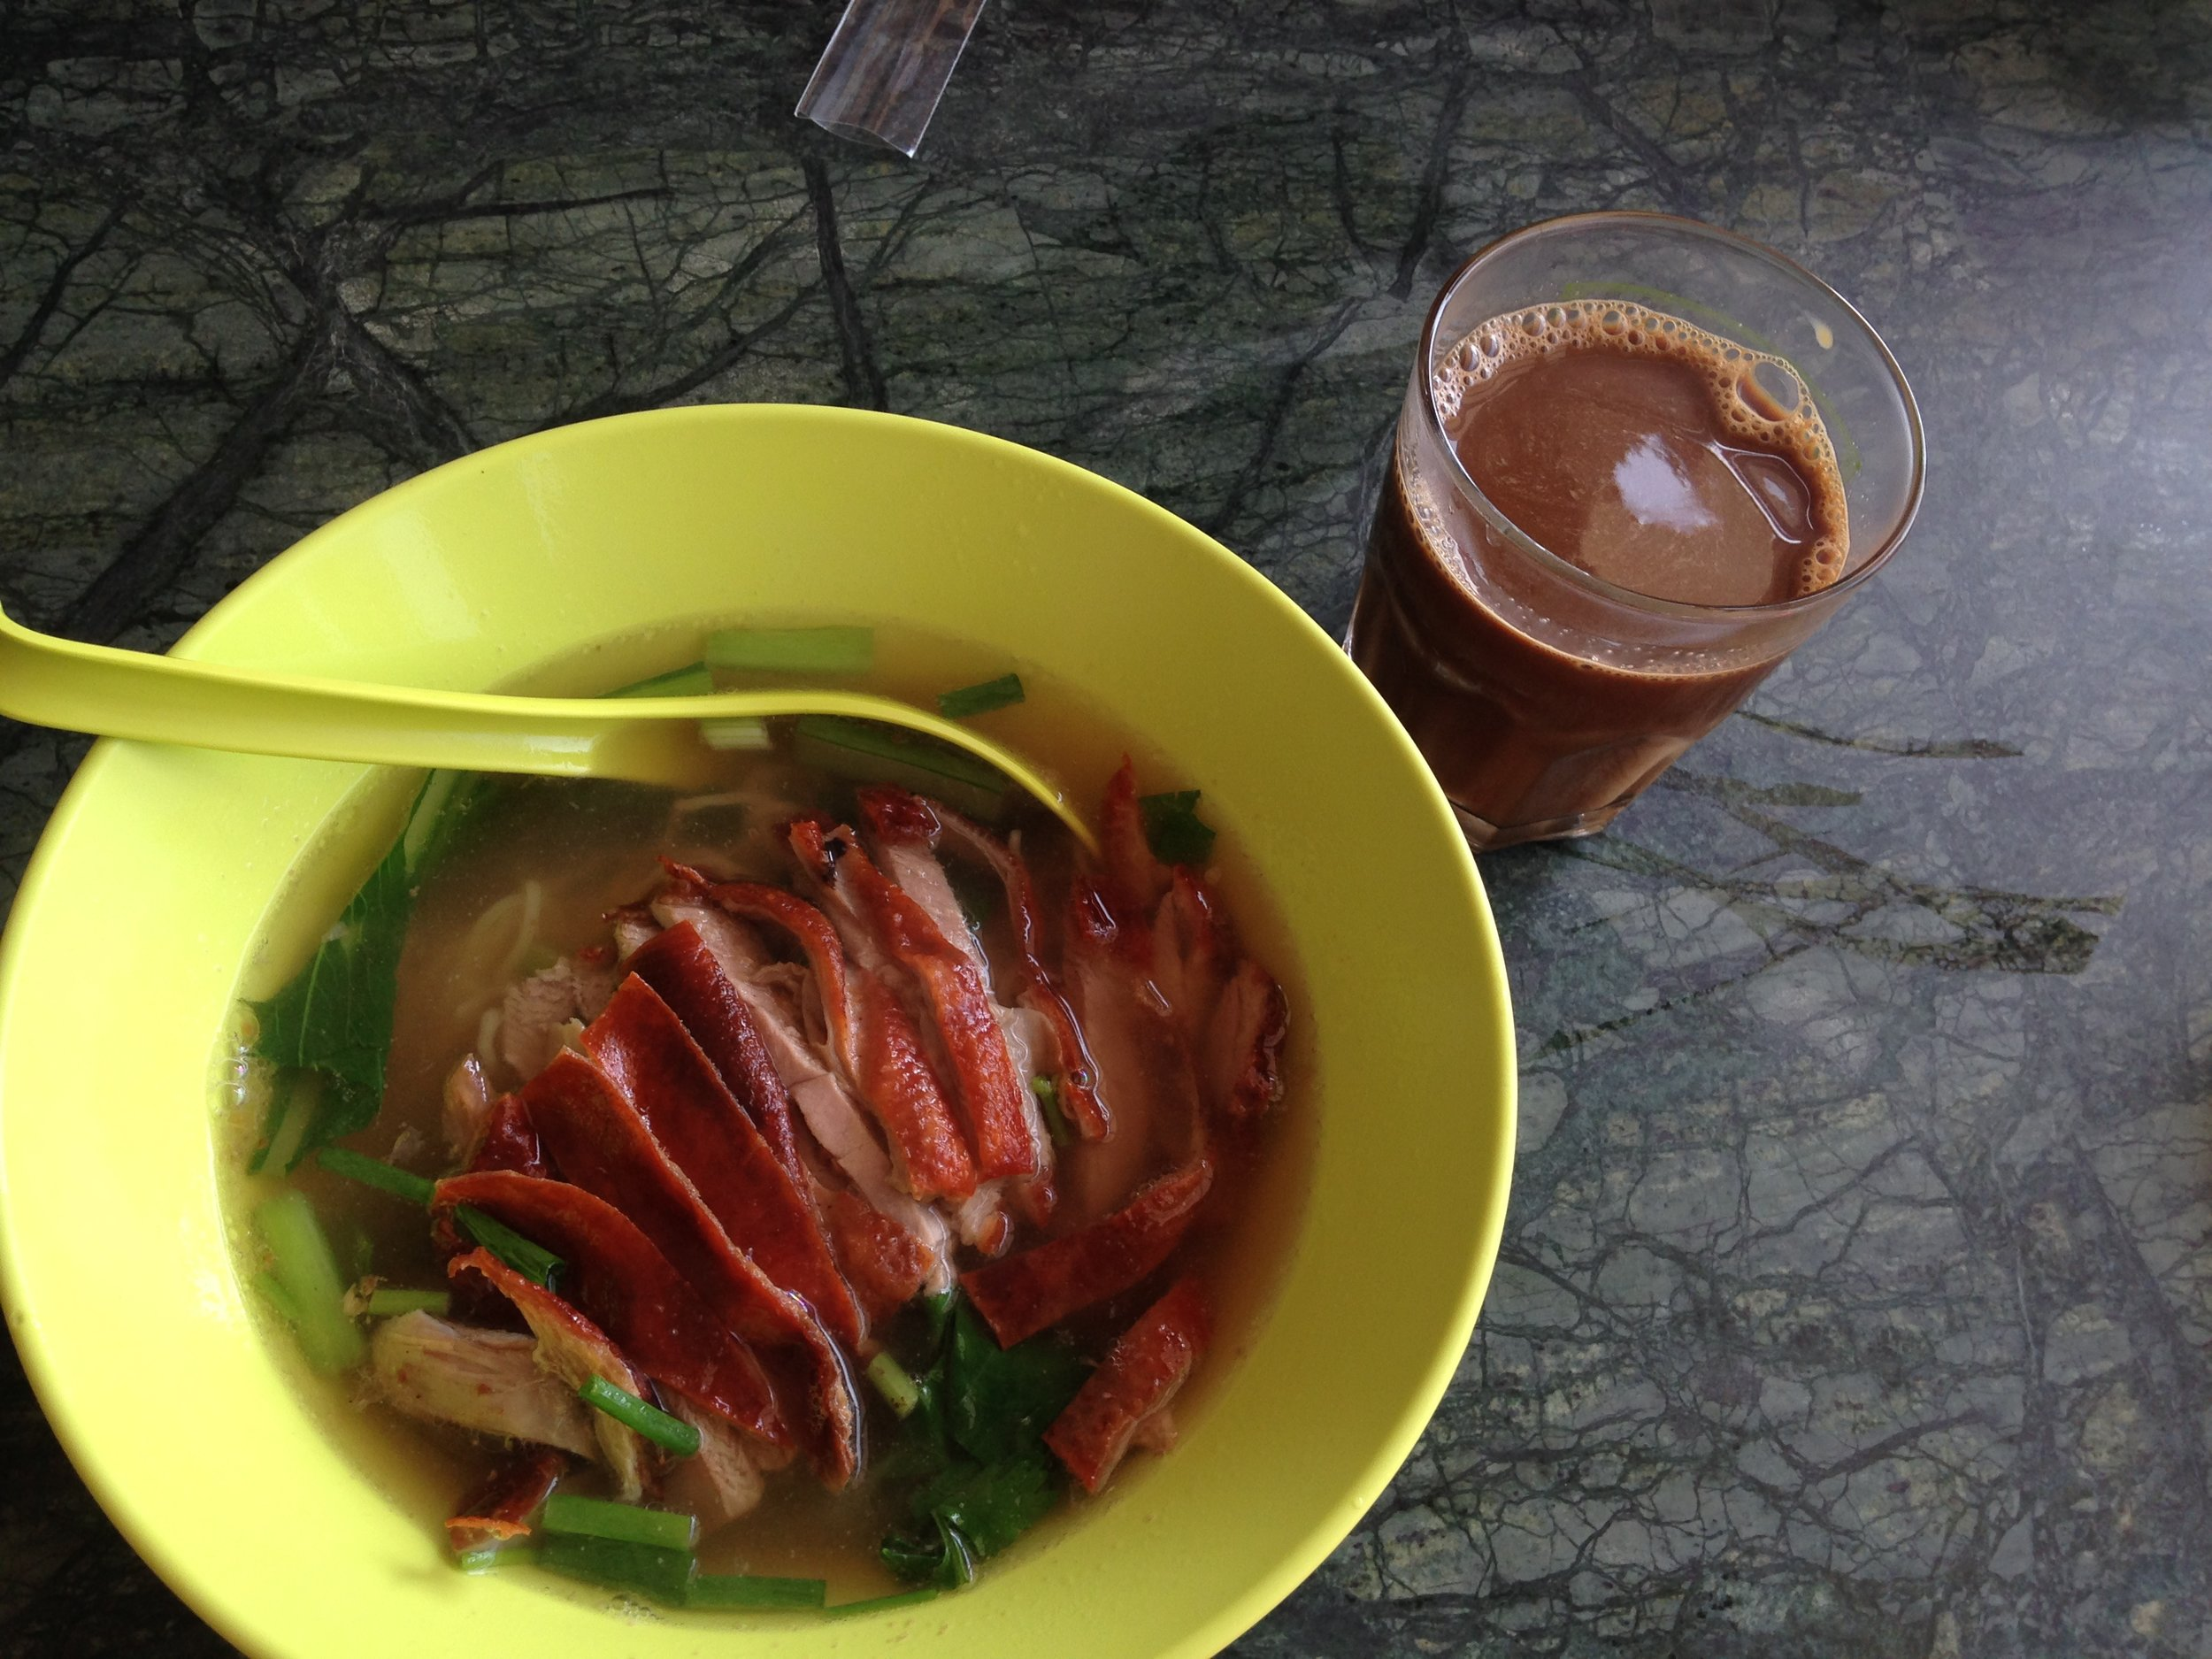 duck noodles for breakfast